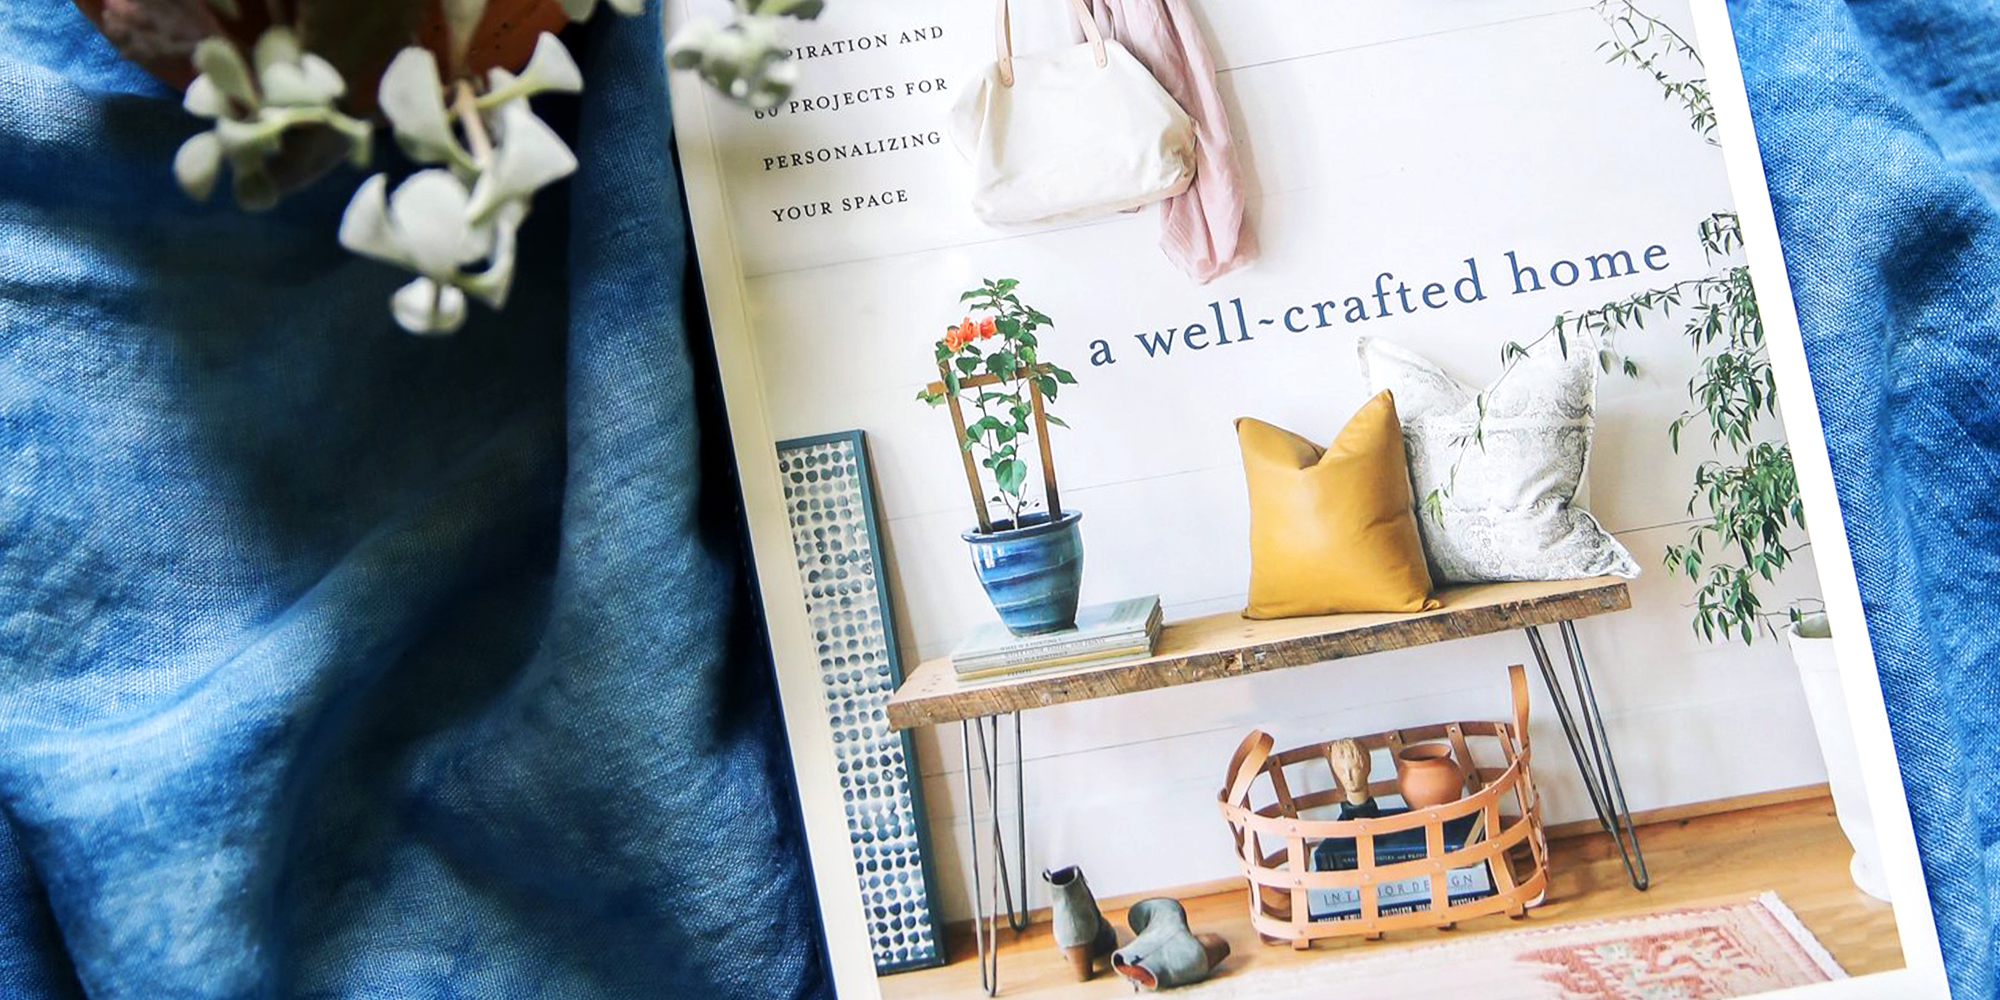 18 best interior design books of 2018 top books for home decor ideas for Interior design and decorating books